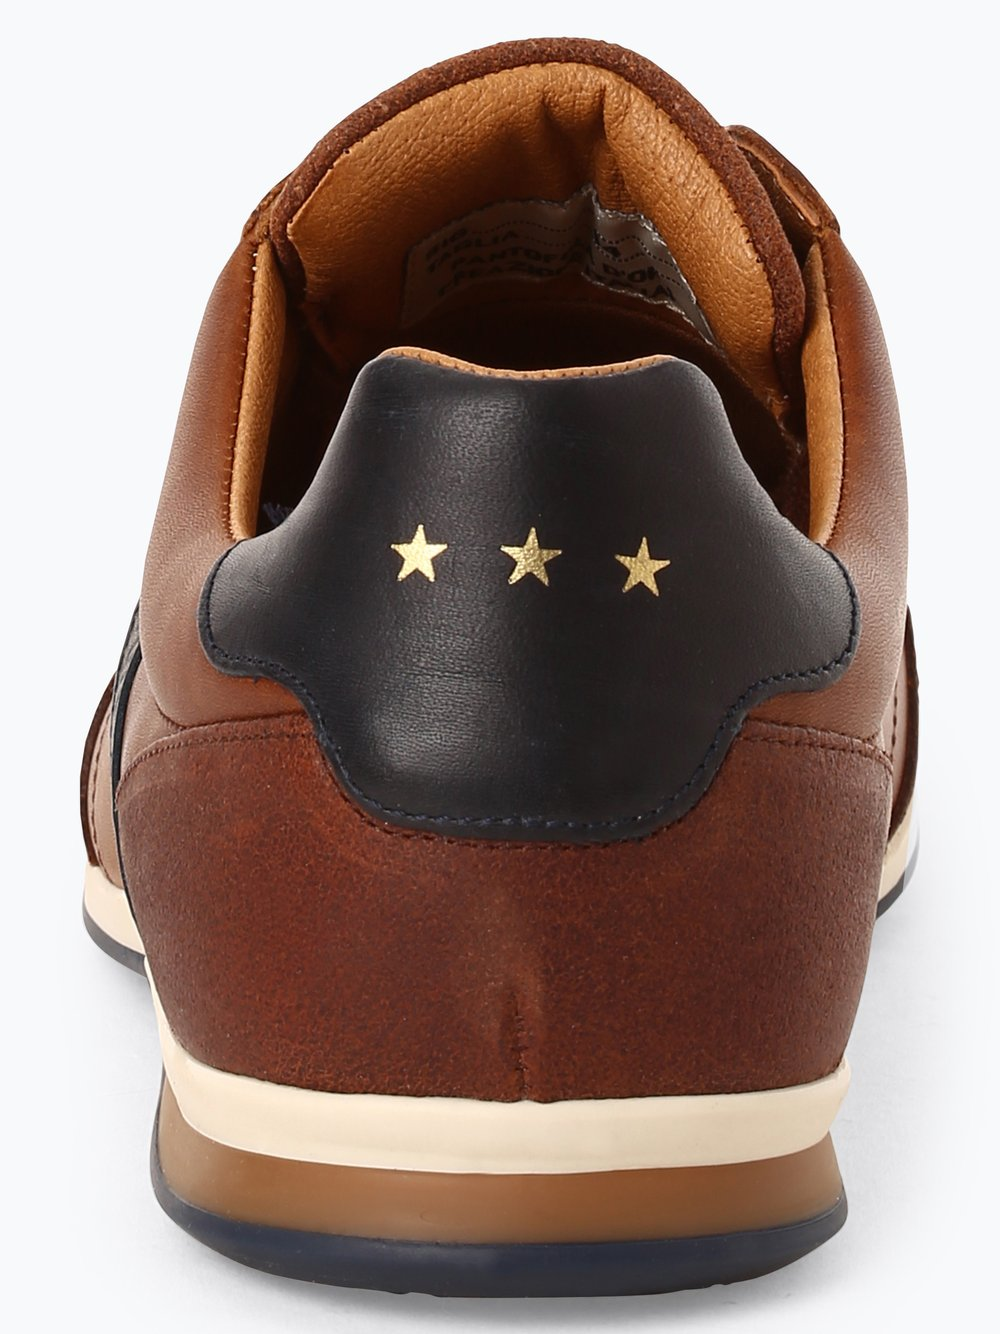 Pantofola d'Oro Herren Sneaker aus Leder Roma Uomo Low